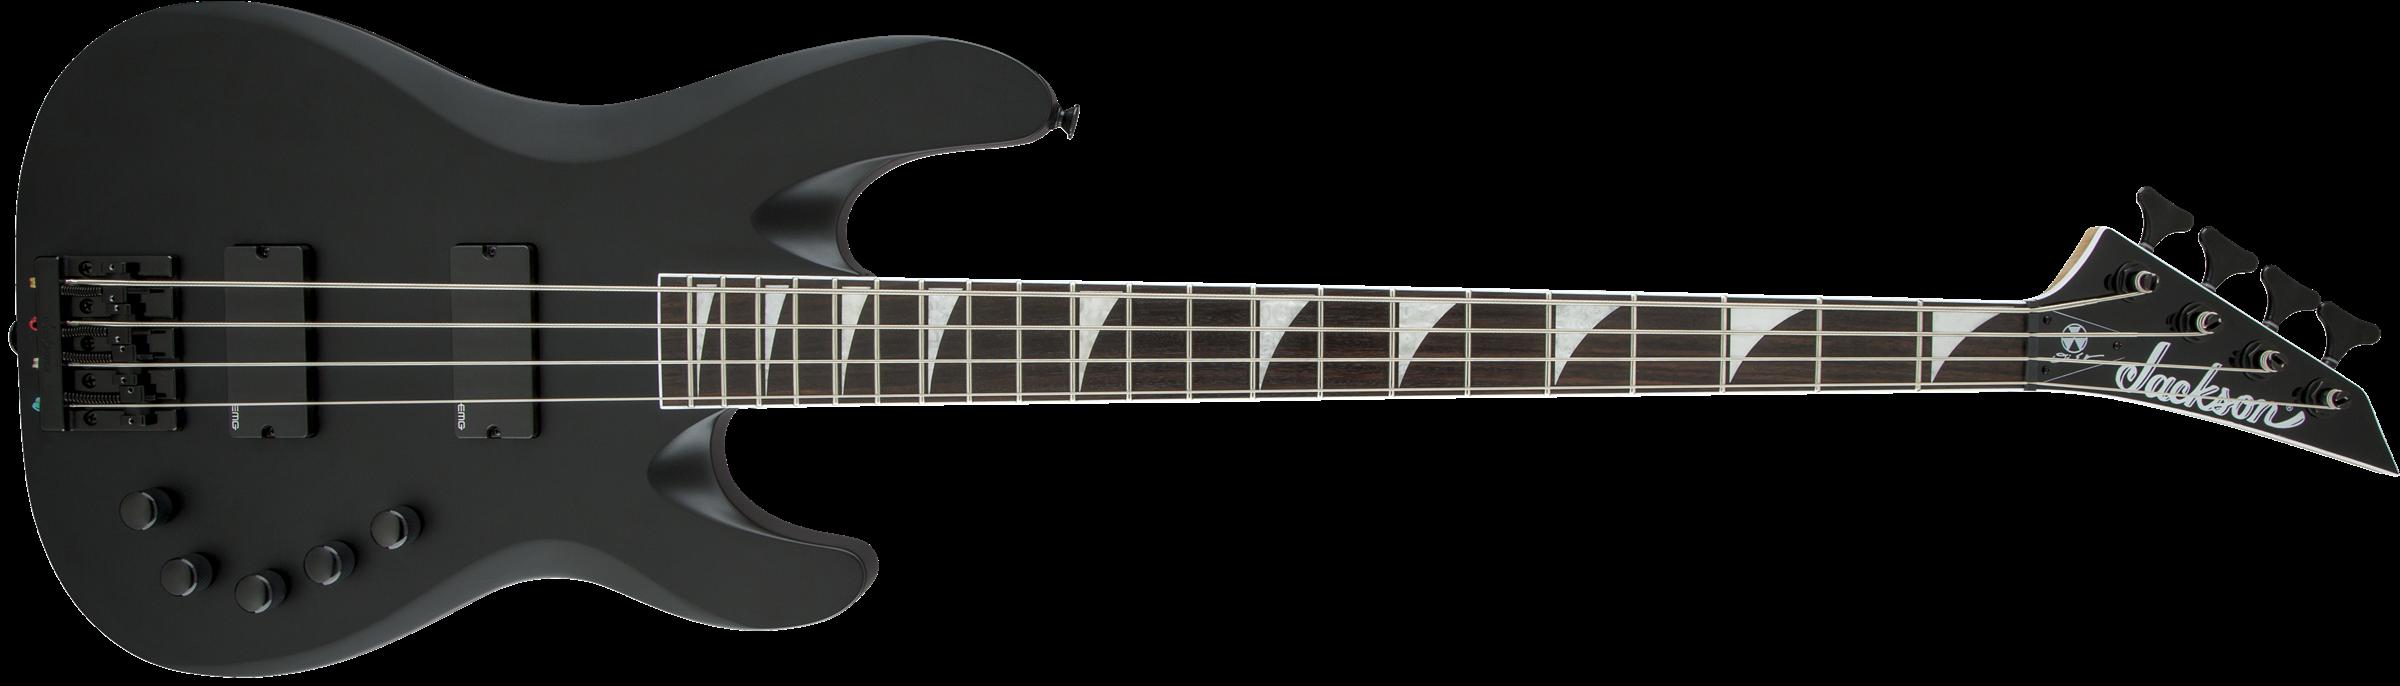 JACKSON X Series Signature David Ellefson Concert Bass CBX IV, Laurel Fingerboard, Satin Black